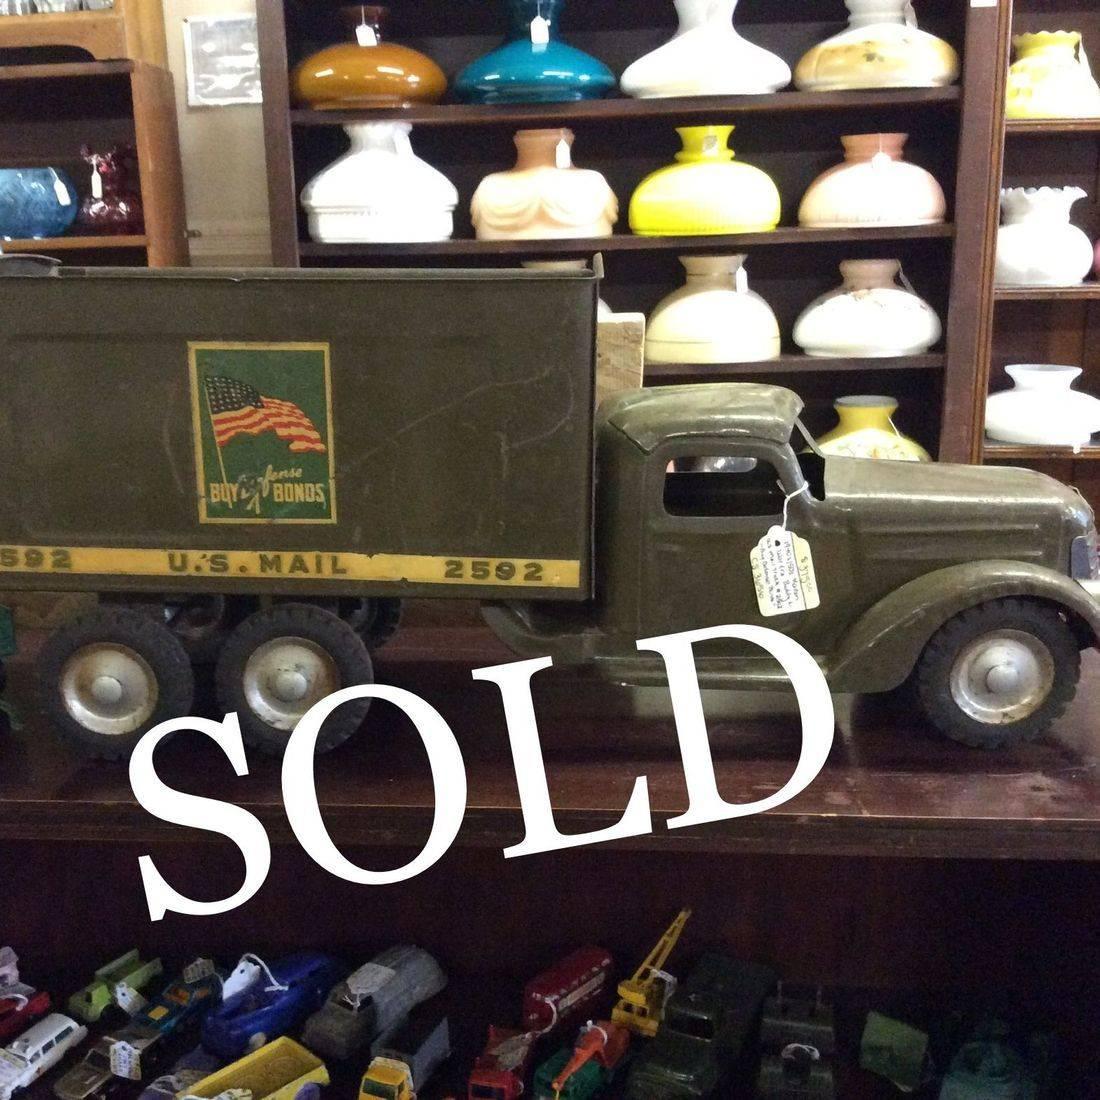 1940's/1950's Korean War Era 'Buddy L.' , U.S. Mail Truck #2592 (no cargo box top)   $375.00